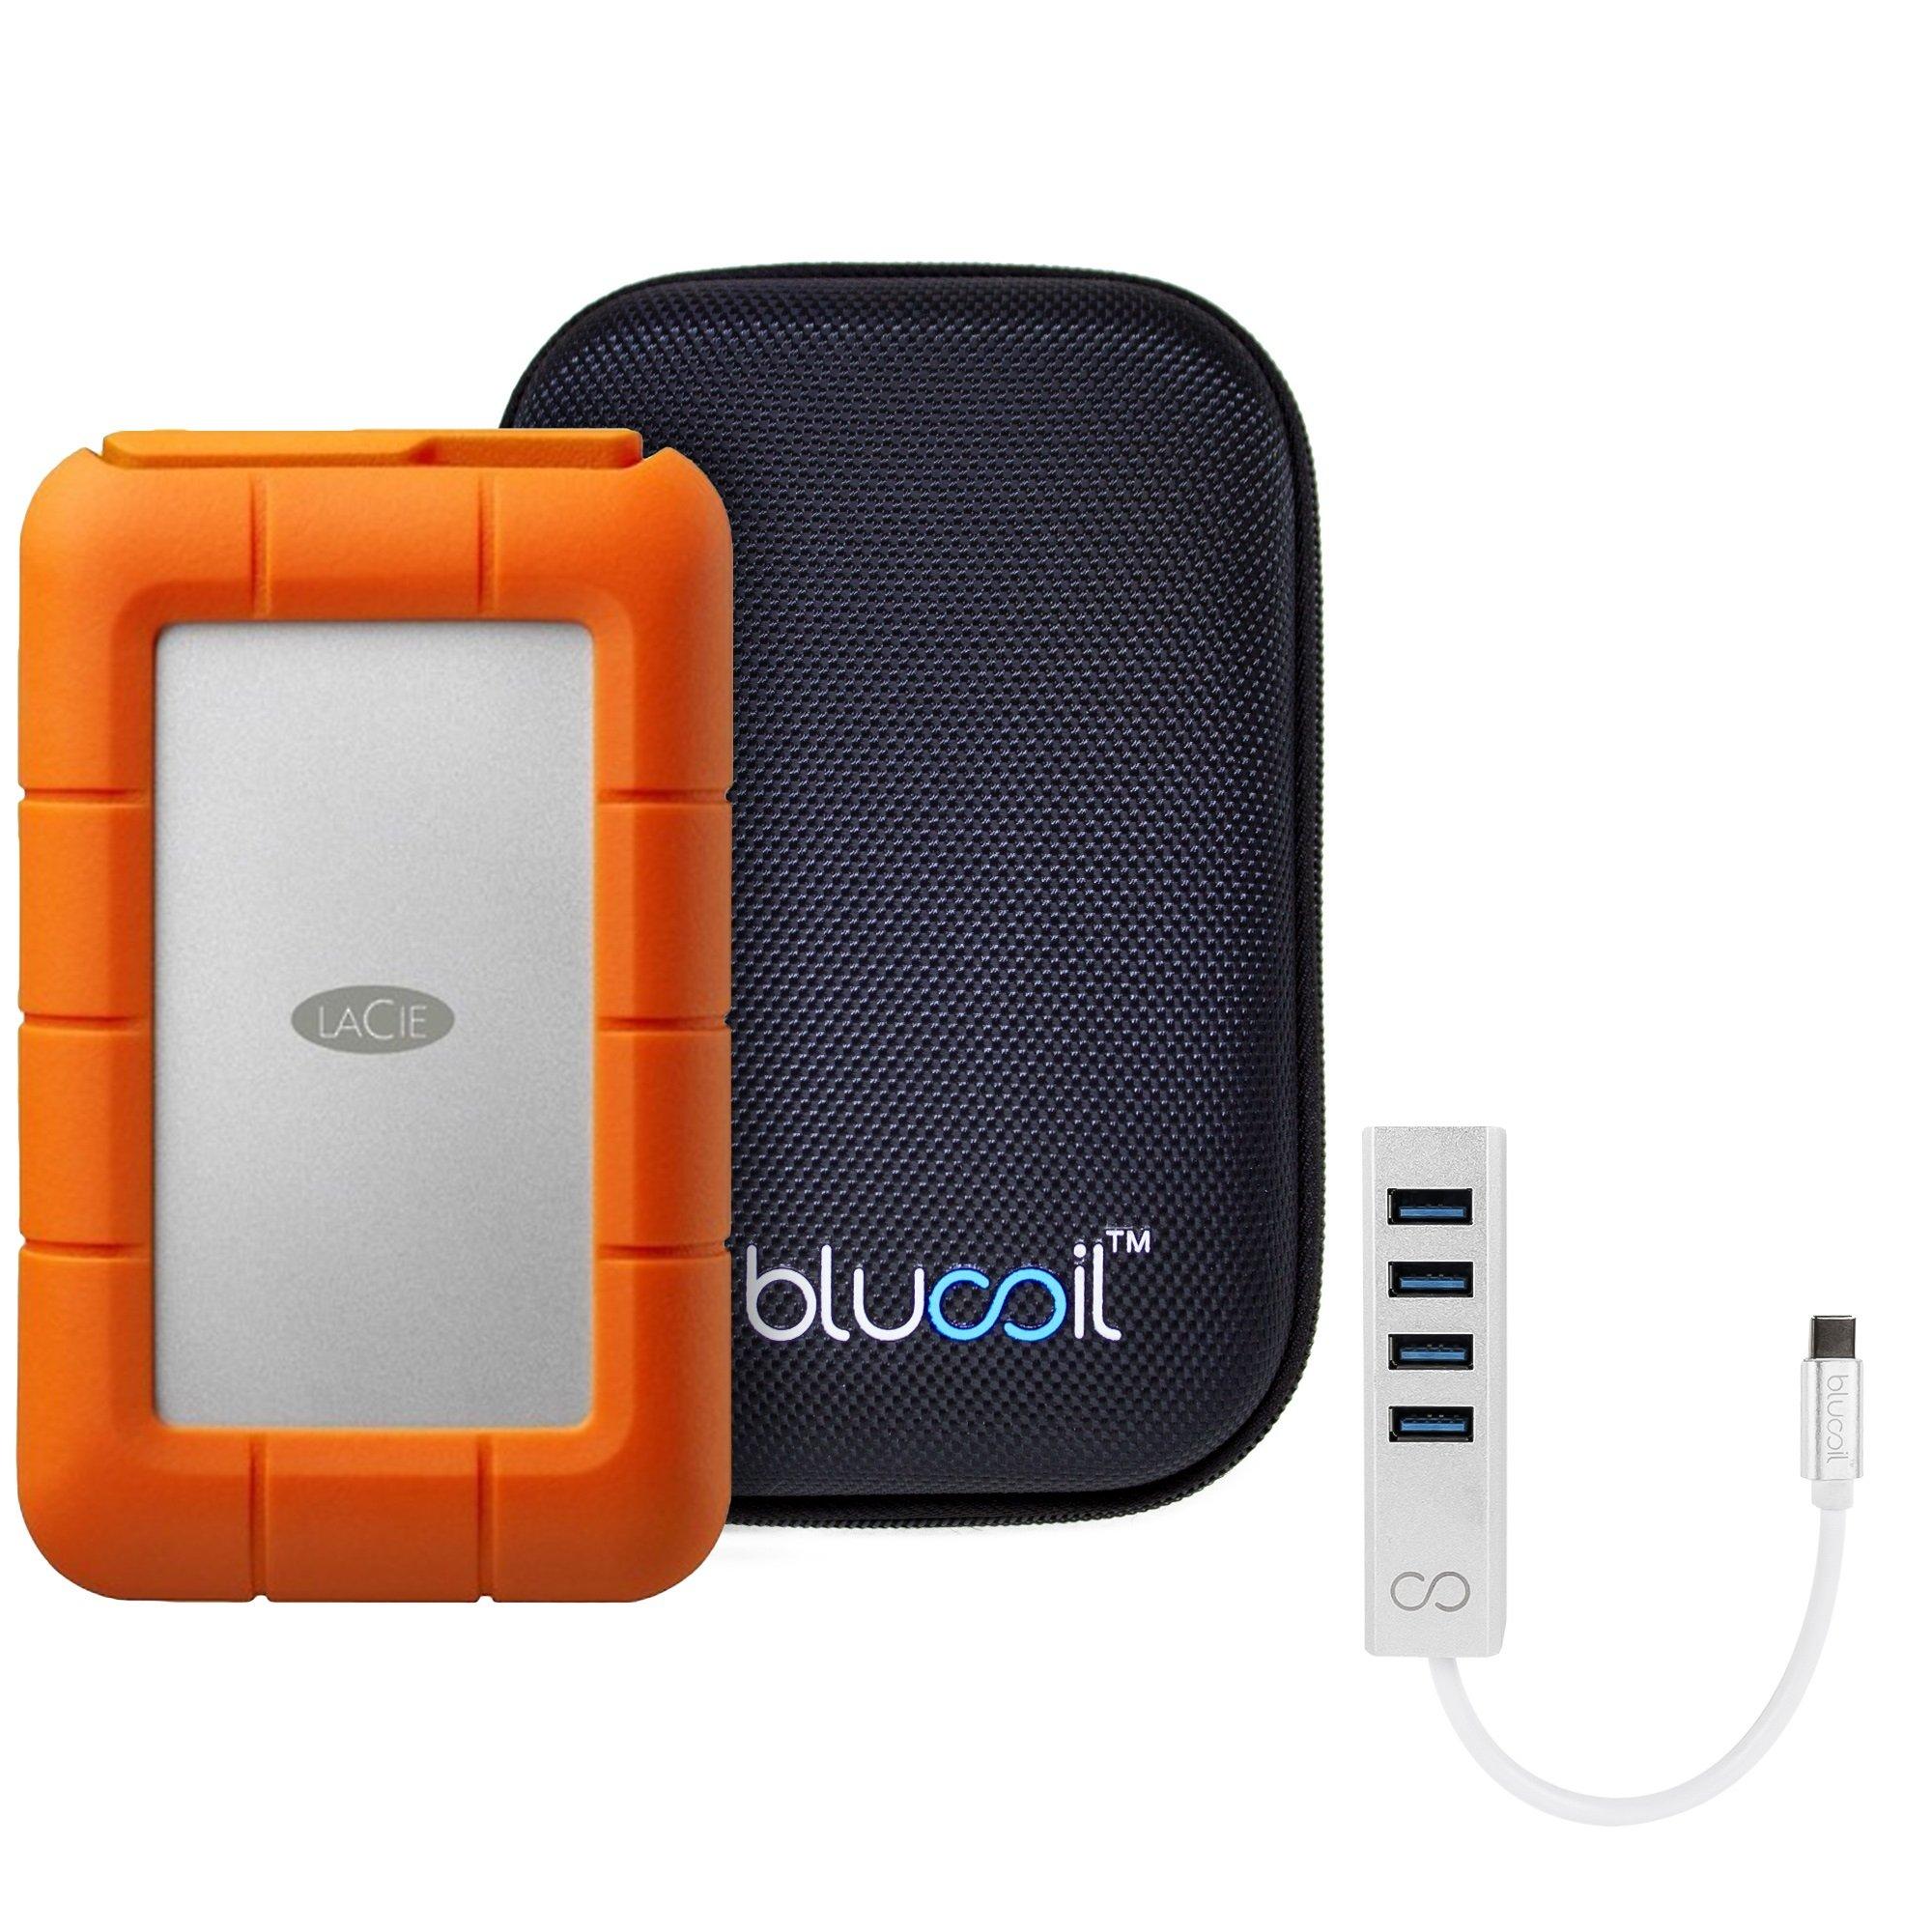 LaCie STFA4000400 Rugged RAID 4TB Mobile Hard Drive with Thunderbolt/USB 3.0 / USB 2.0 BUNDLED WITH Blucoil Portable Shockproof Hard Case AND Mini USB-C Hub